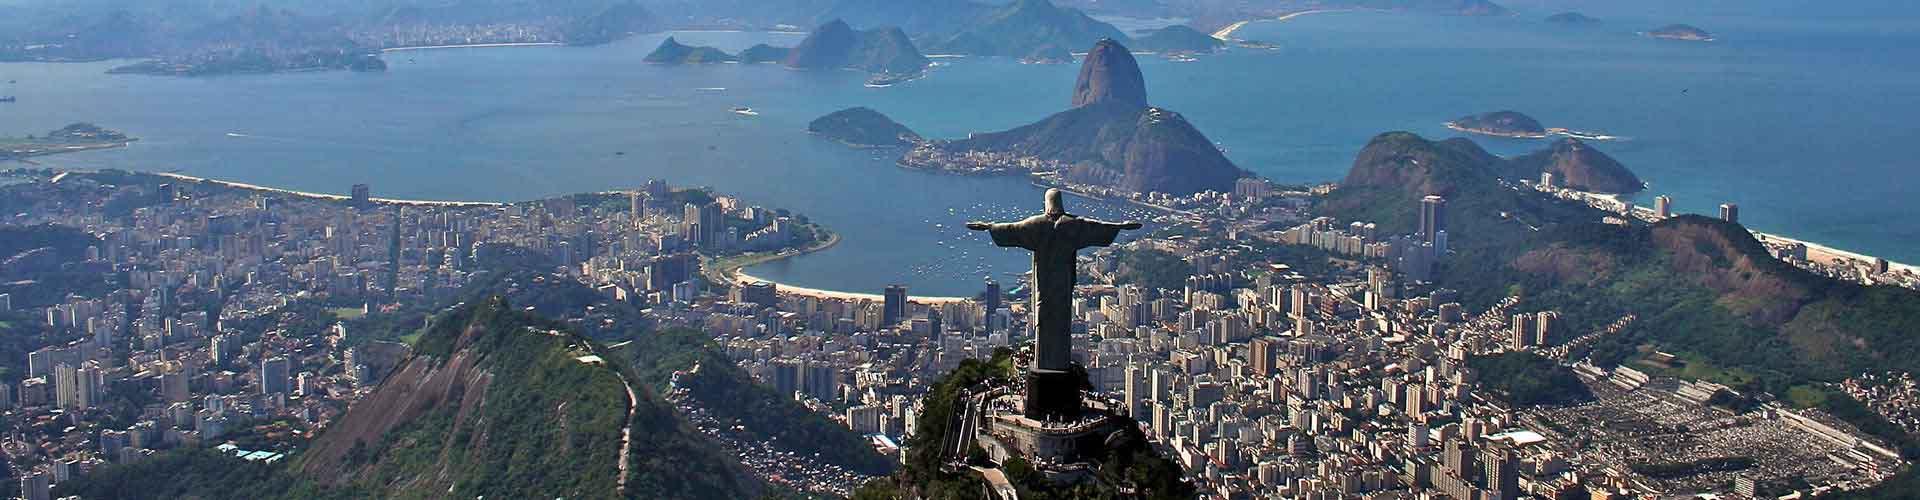 Rio de Janeiro – Campeggi vicini a Aeroporto di Santos Dumont. Mappe per Rio de Janeiro, Foto e  Recensioni per ogni Campeggio a Rio de Janeiro.